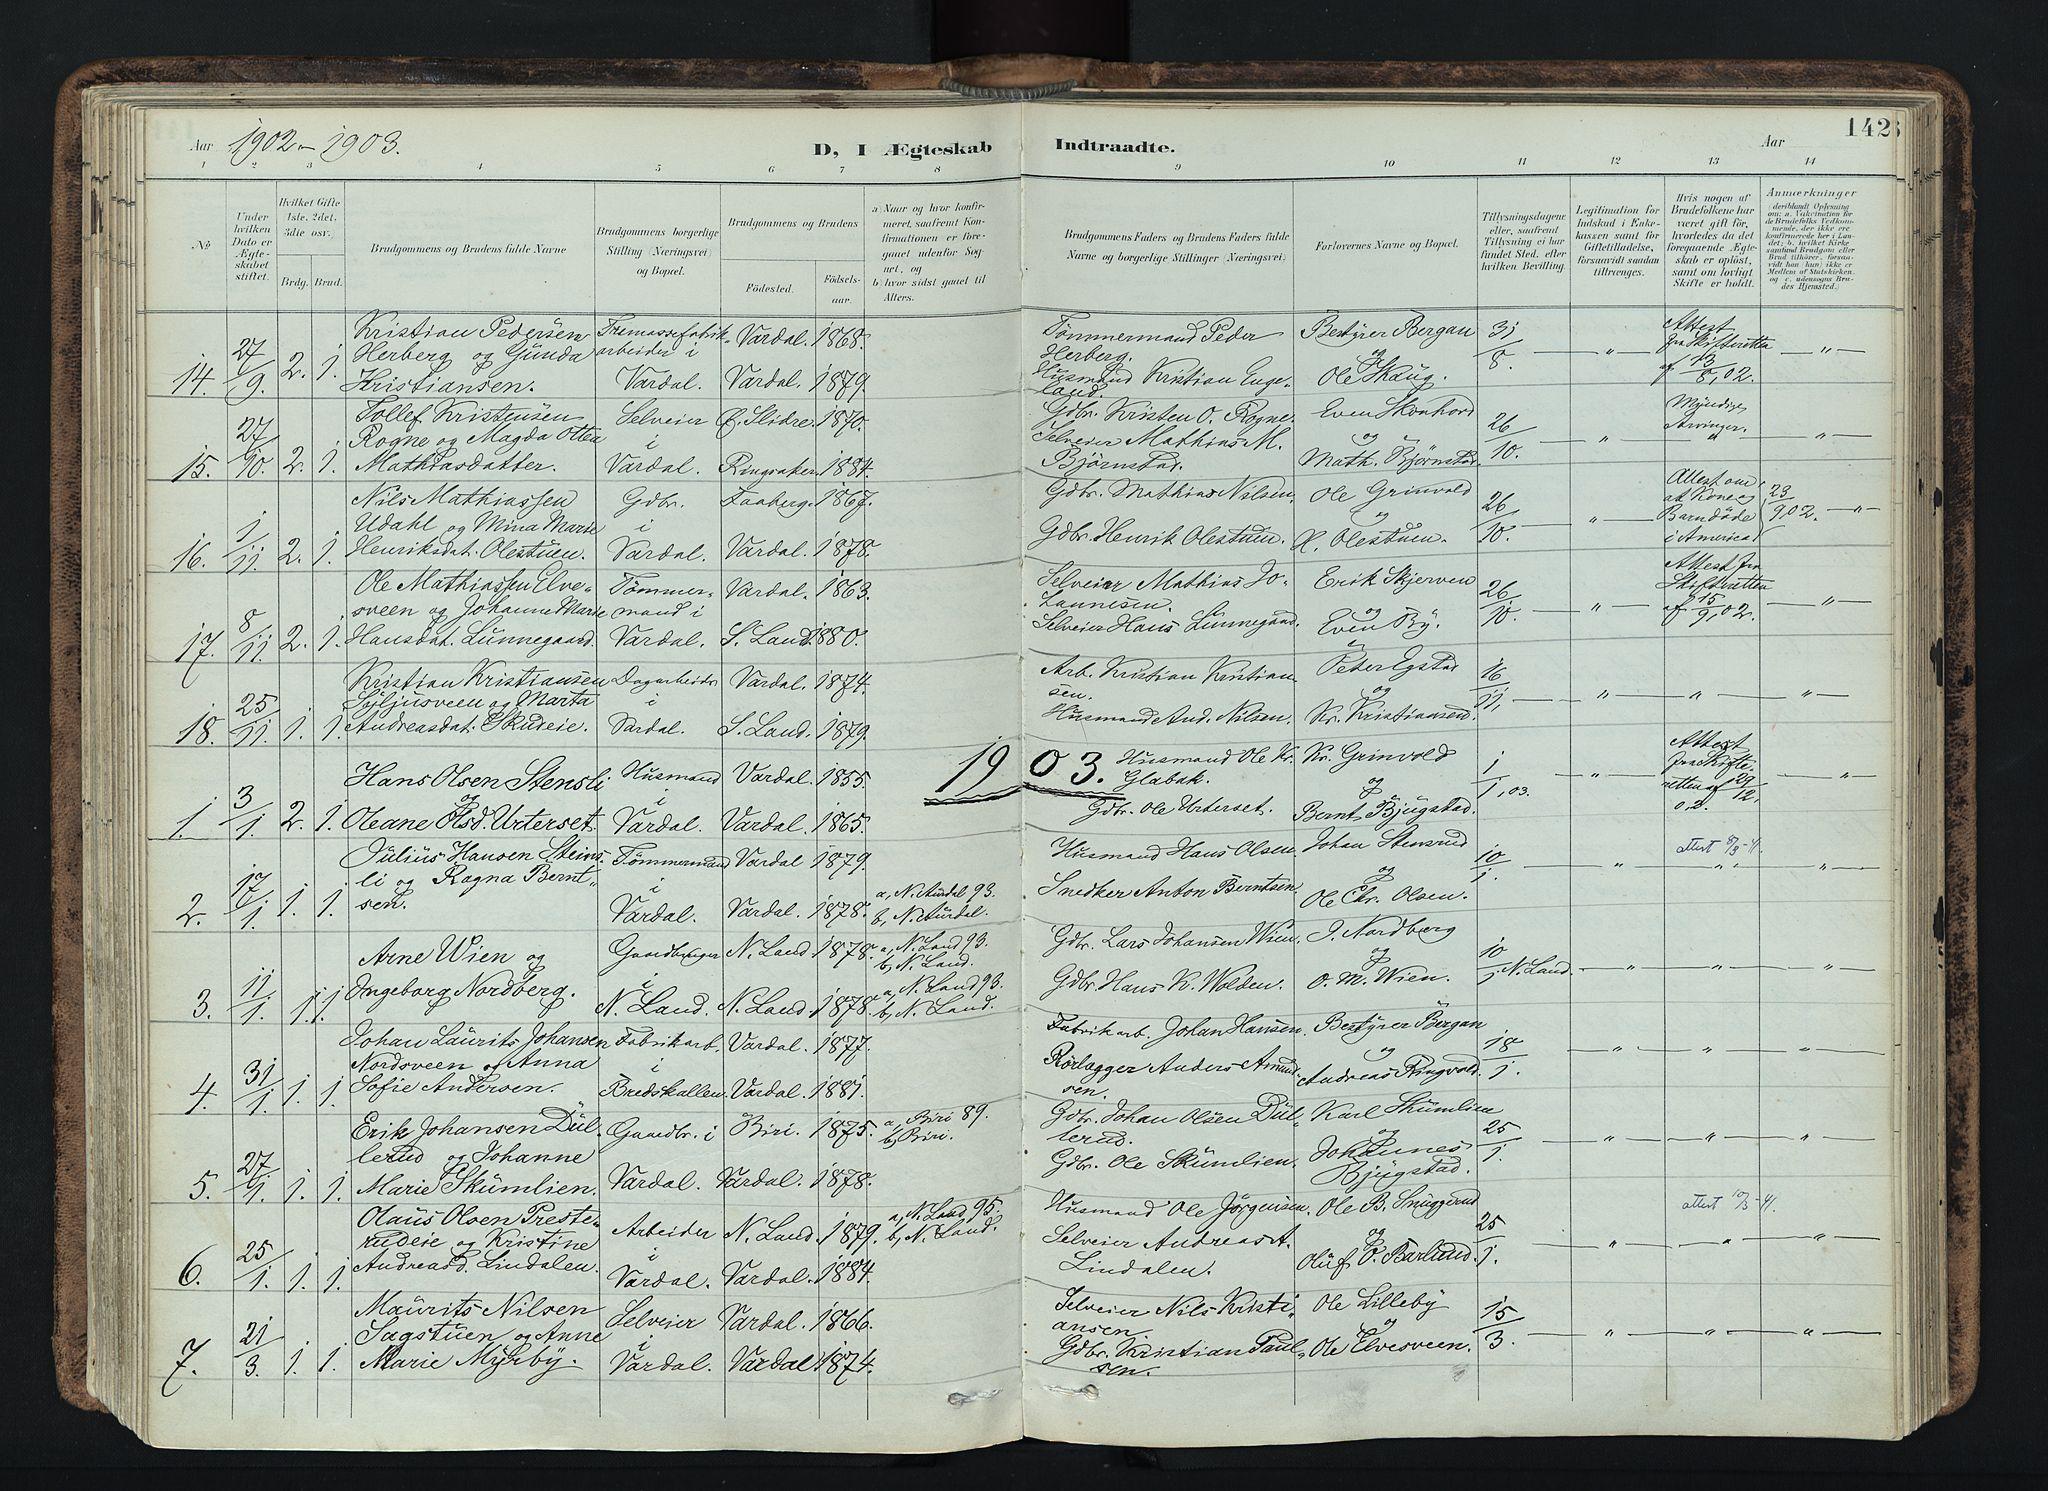 SAH, Vardal prestekontor, H/Ha/Haa/L0019: Ministerialbok nr. 19, 1893-1907, s. 142